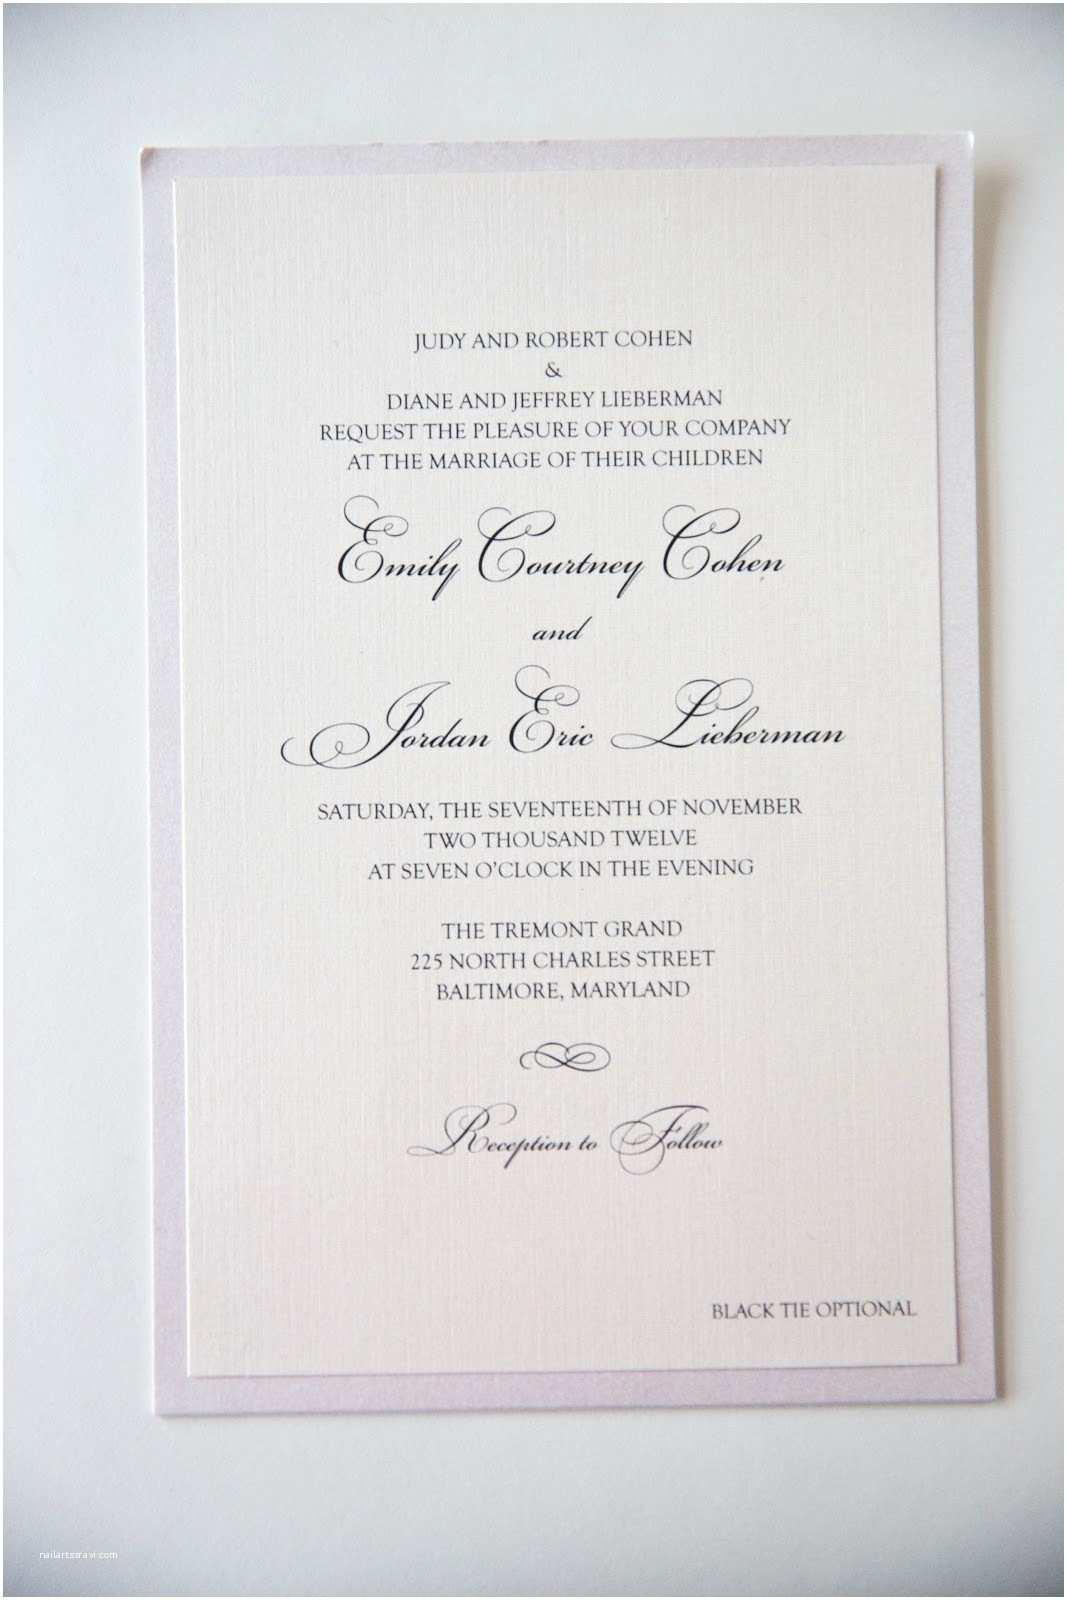 Bride and Groom Wedding Invitations 45 Spectacular Simple Wedding Invitation Wording From